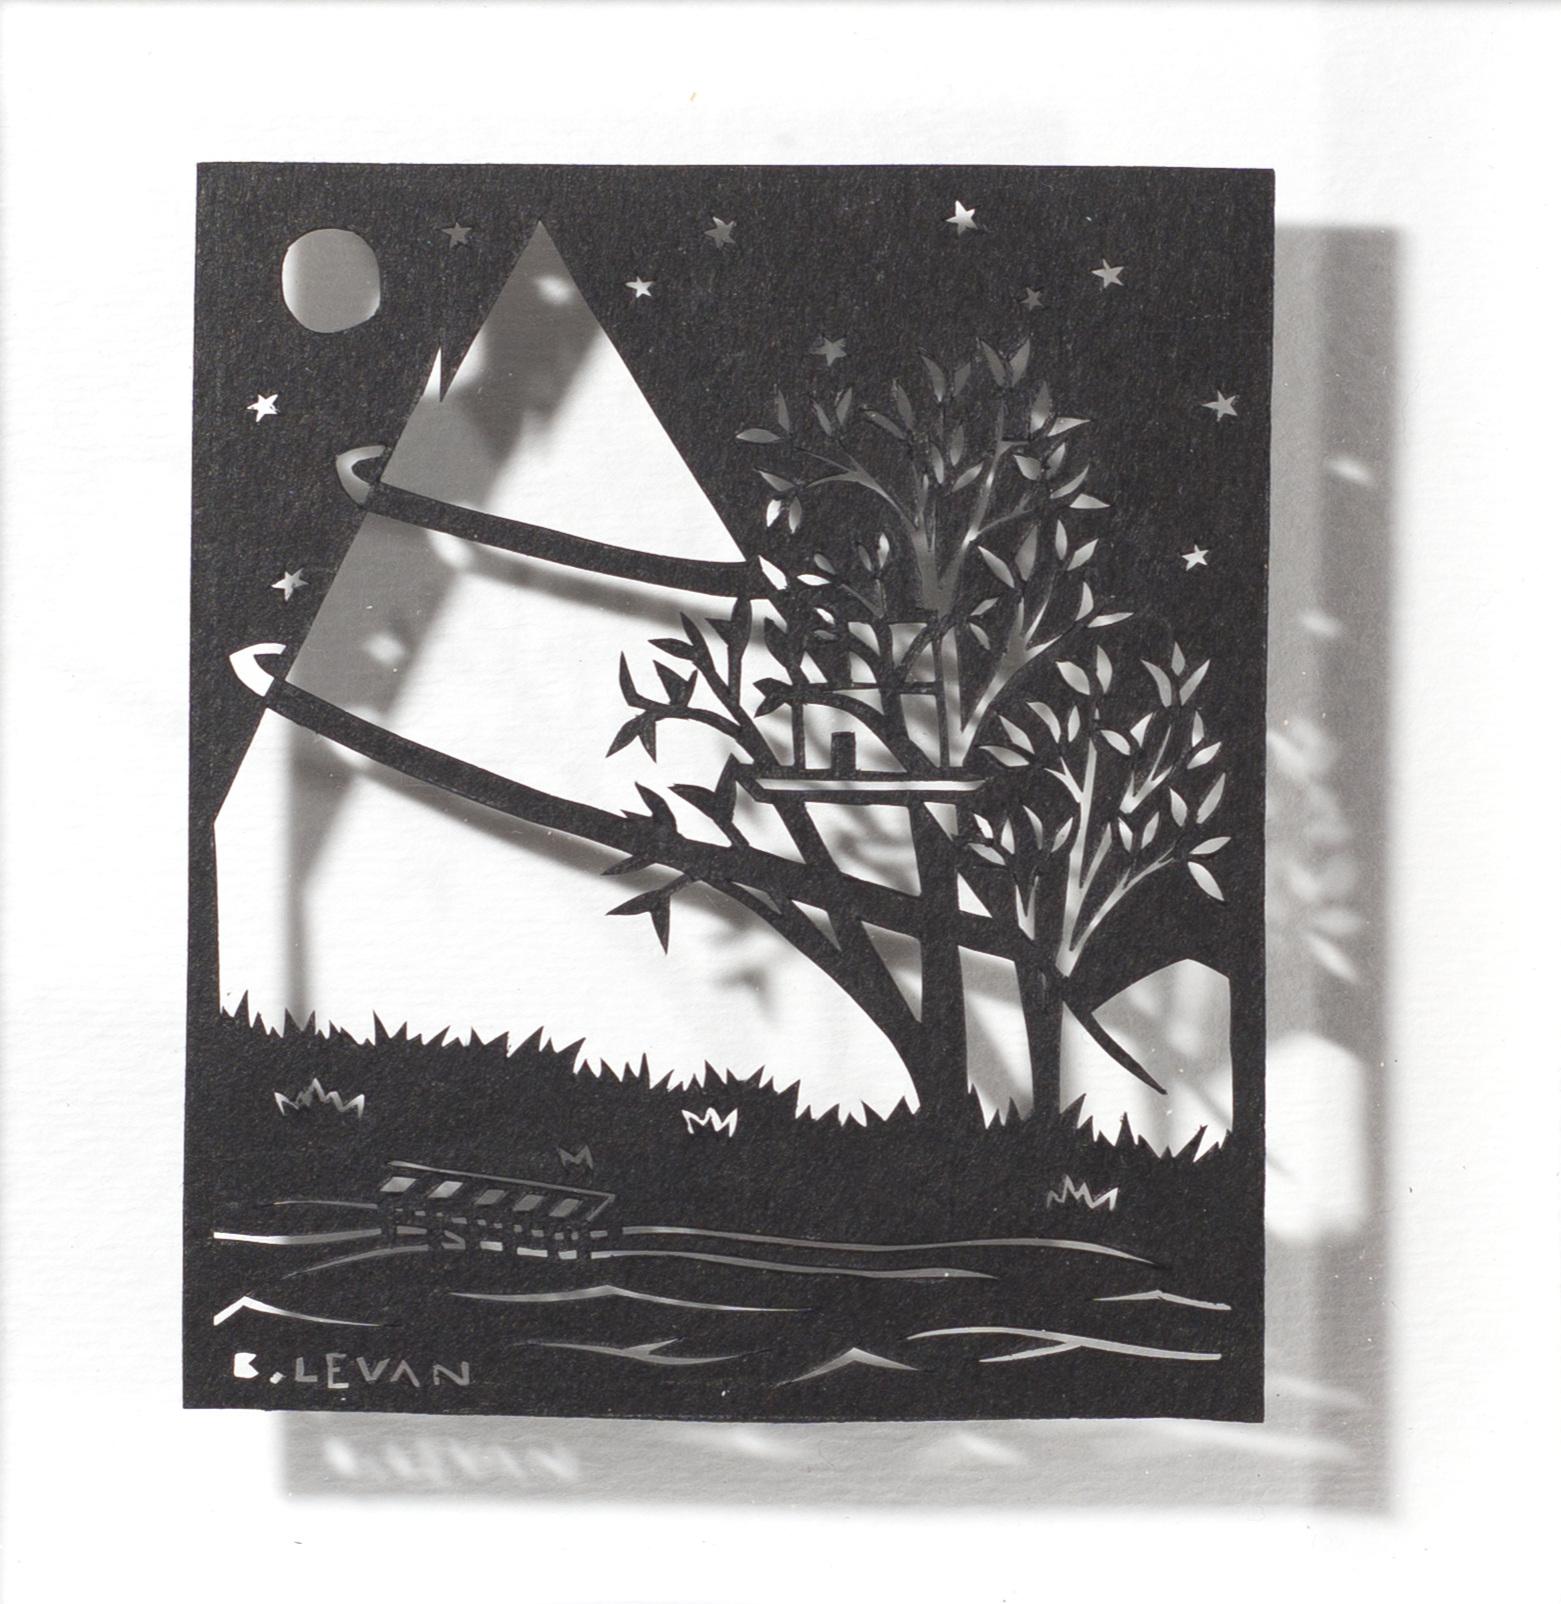 Where the Tree Meets the Sky